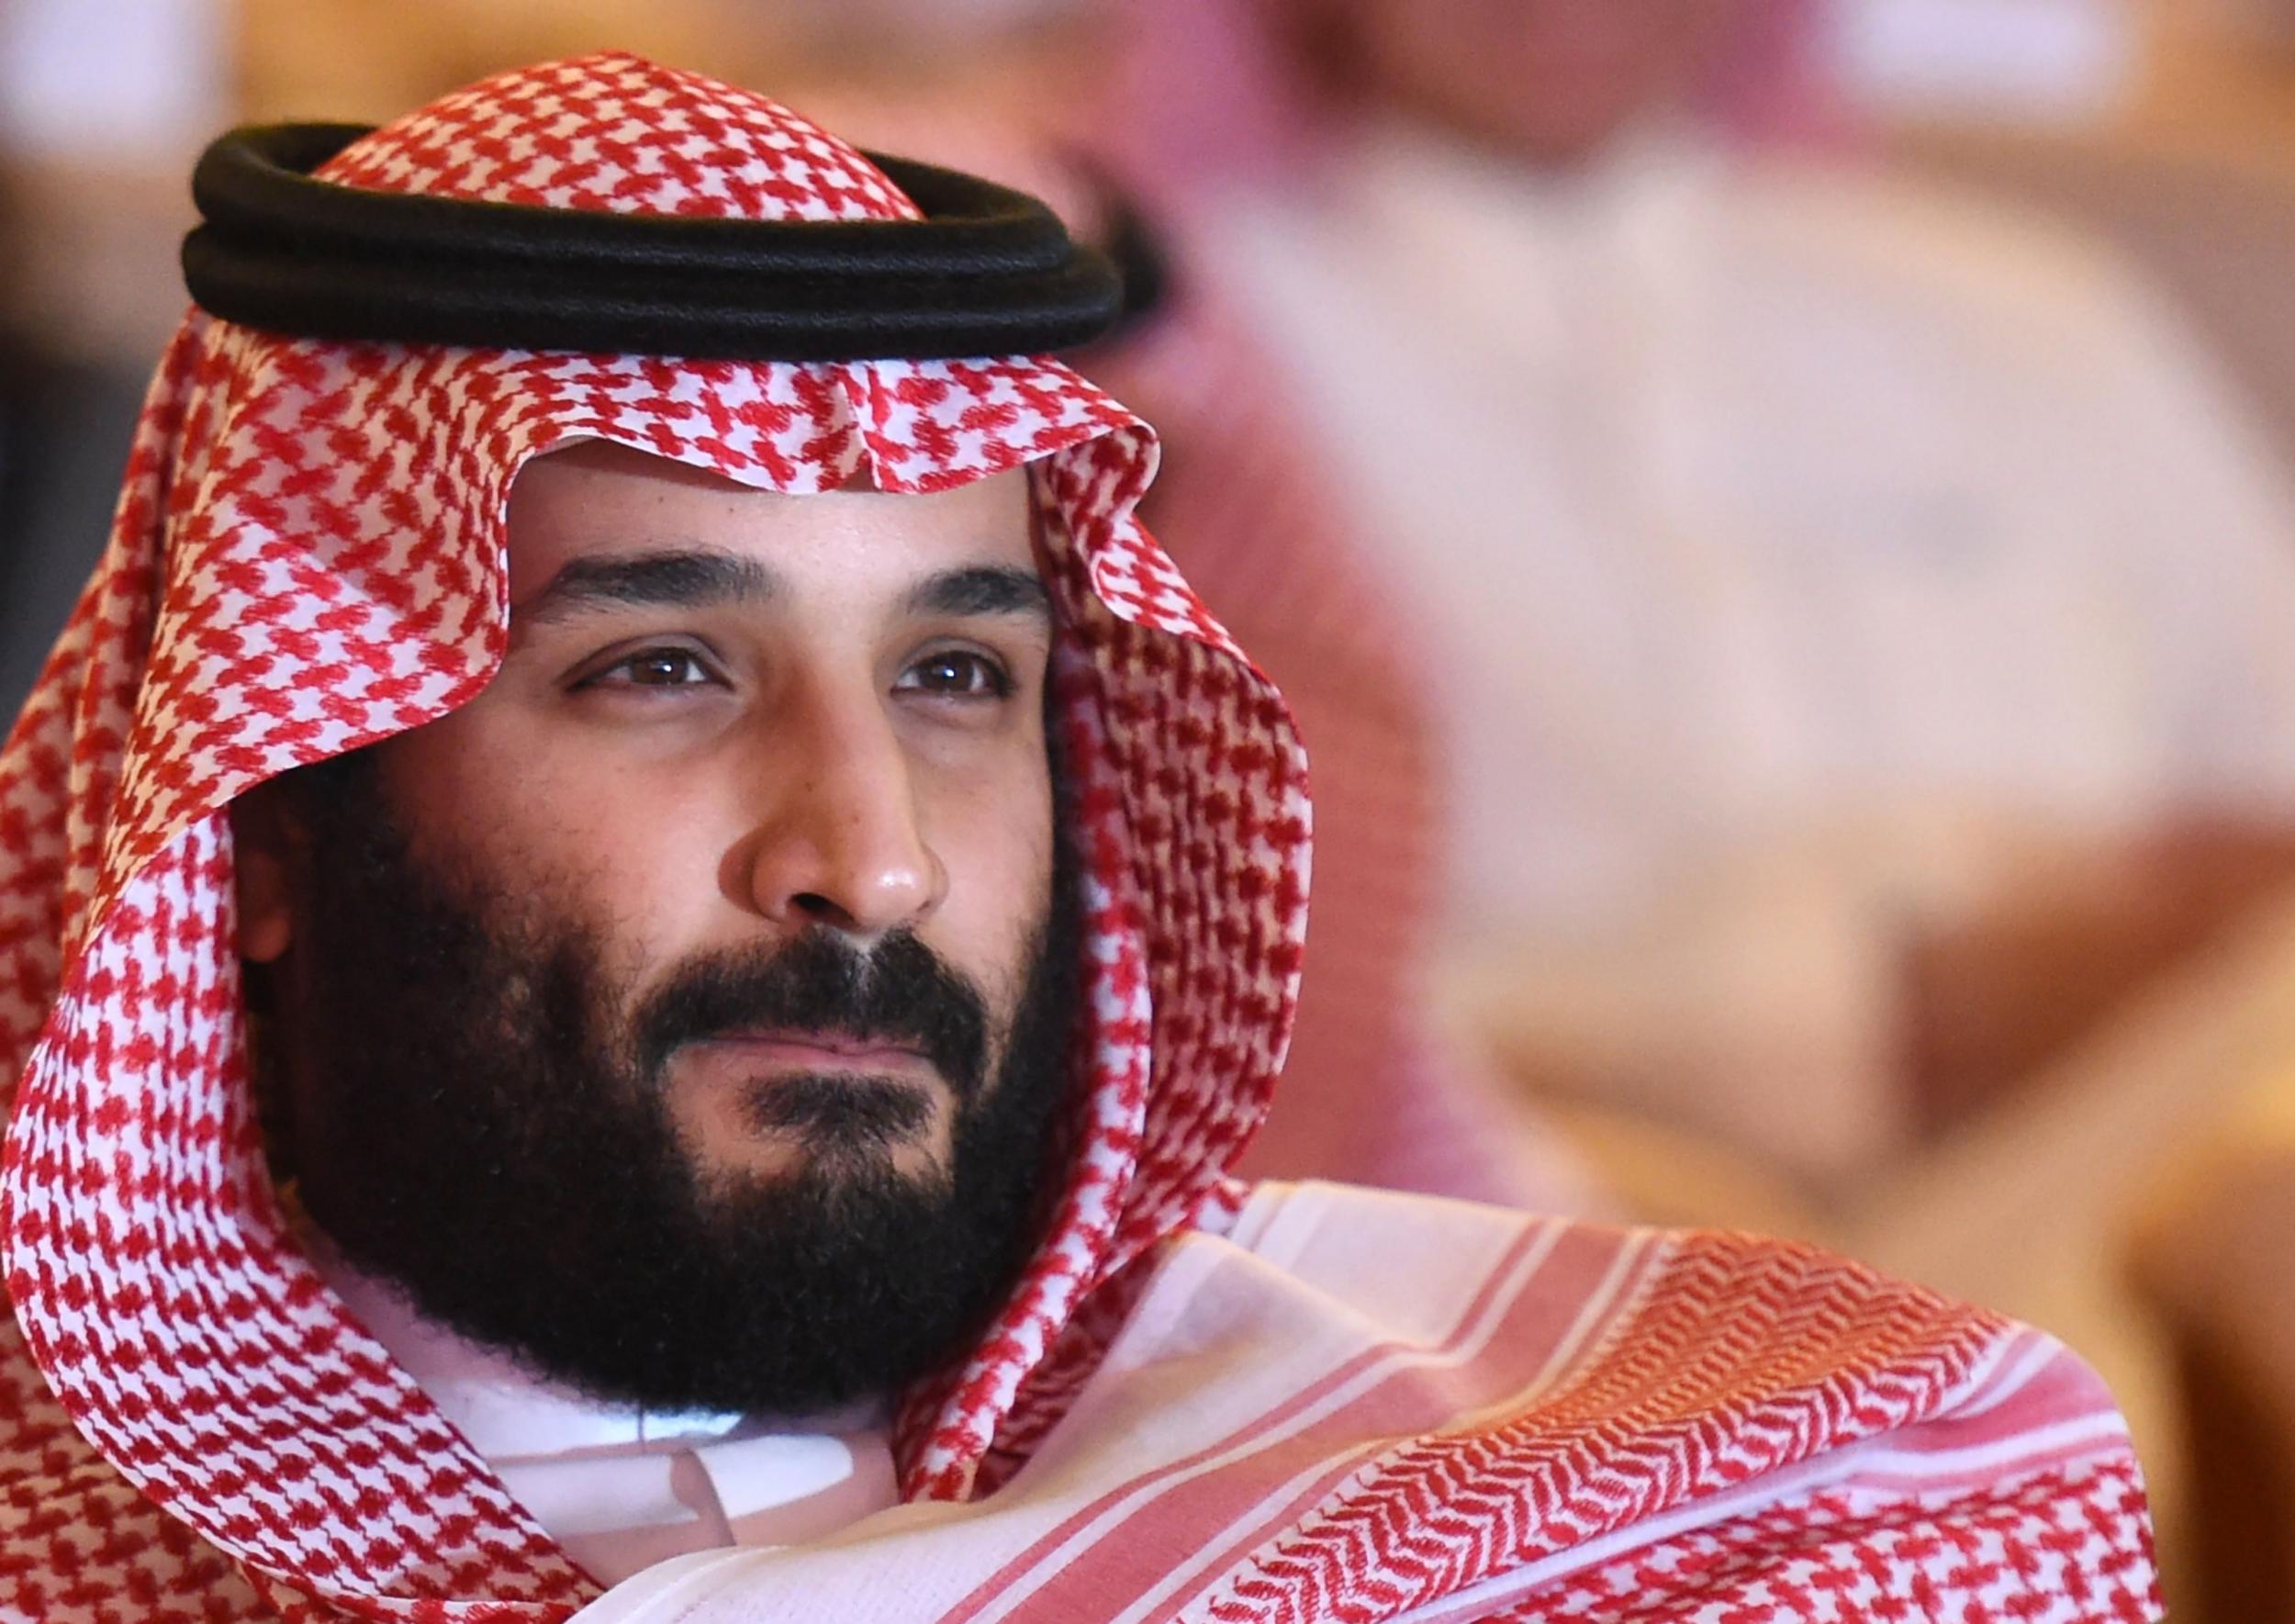 Britons protesting Mohammed bin Salman's visit 'misunderstand war in Yemen', Saudi foreign minister claims